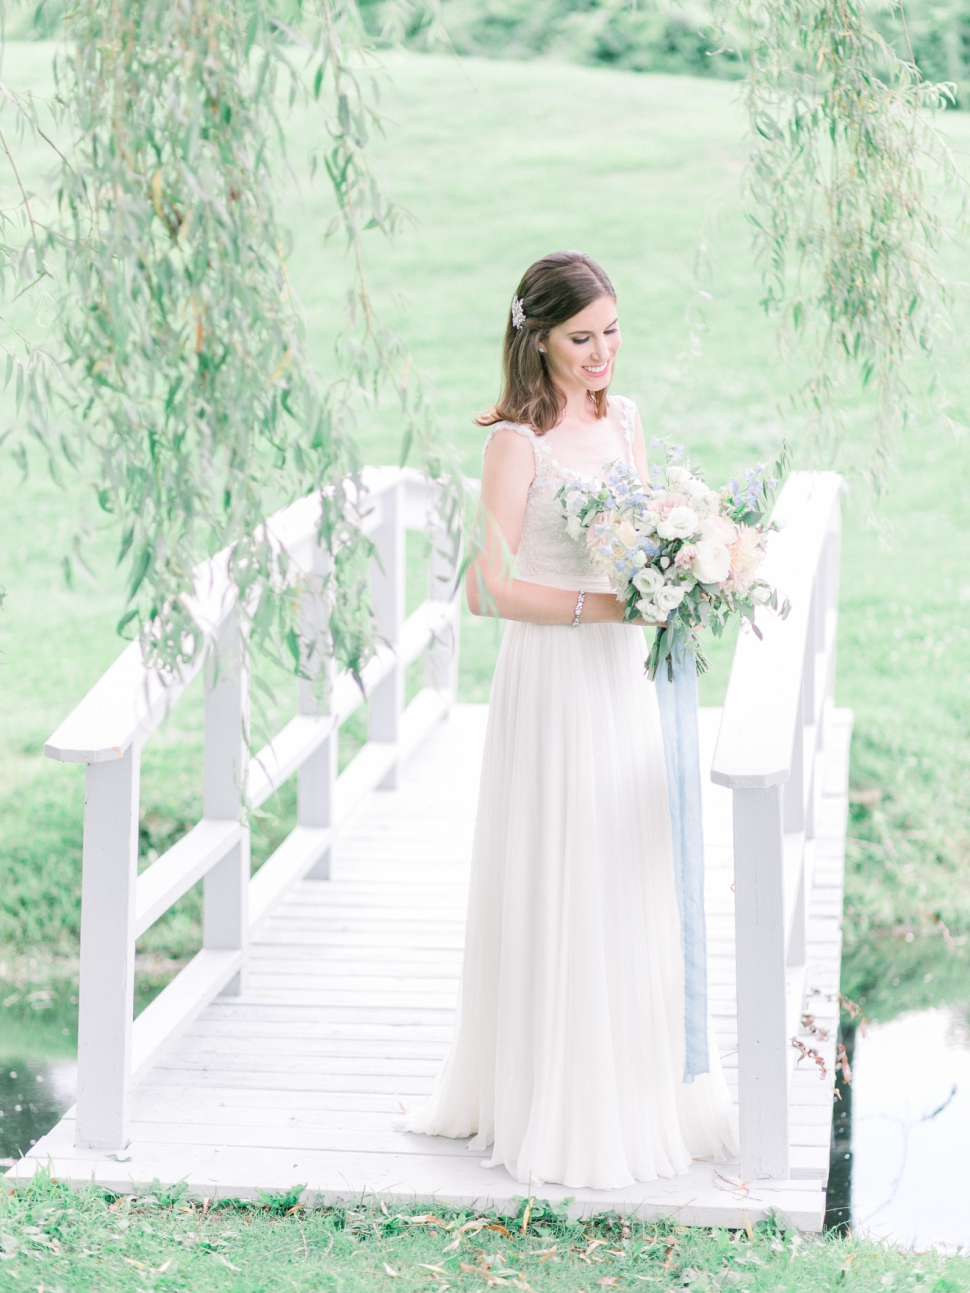 Connecticut-Wedding-Photographer-Cassi-Claire-Barns-at-Wesleyan-Hills-Wedding_11.jpg